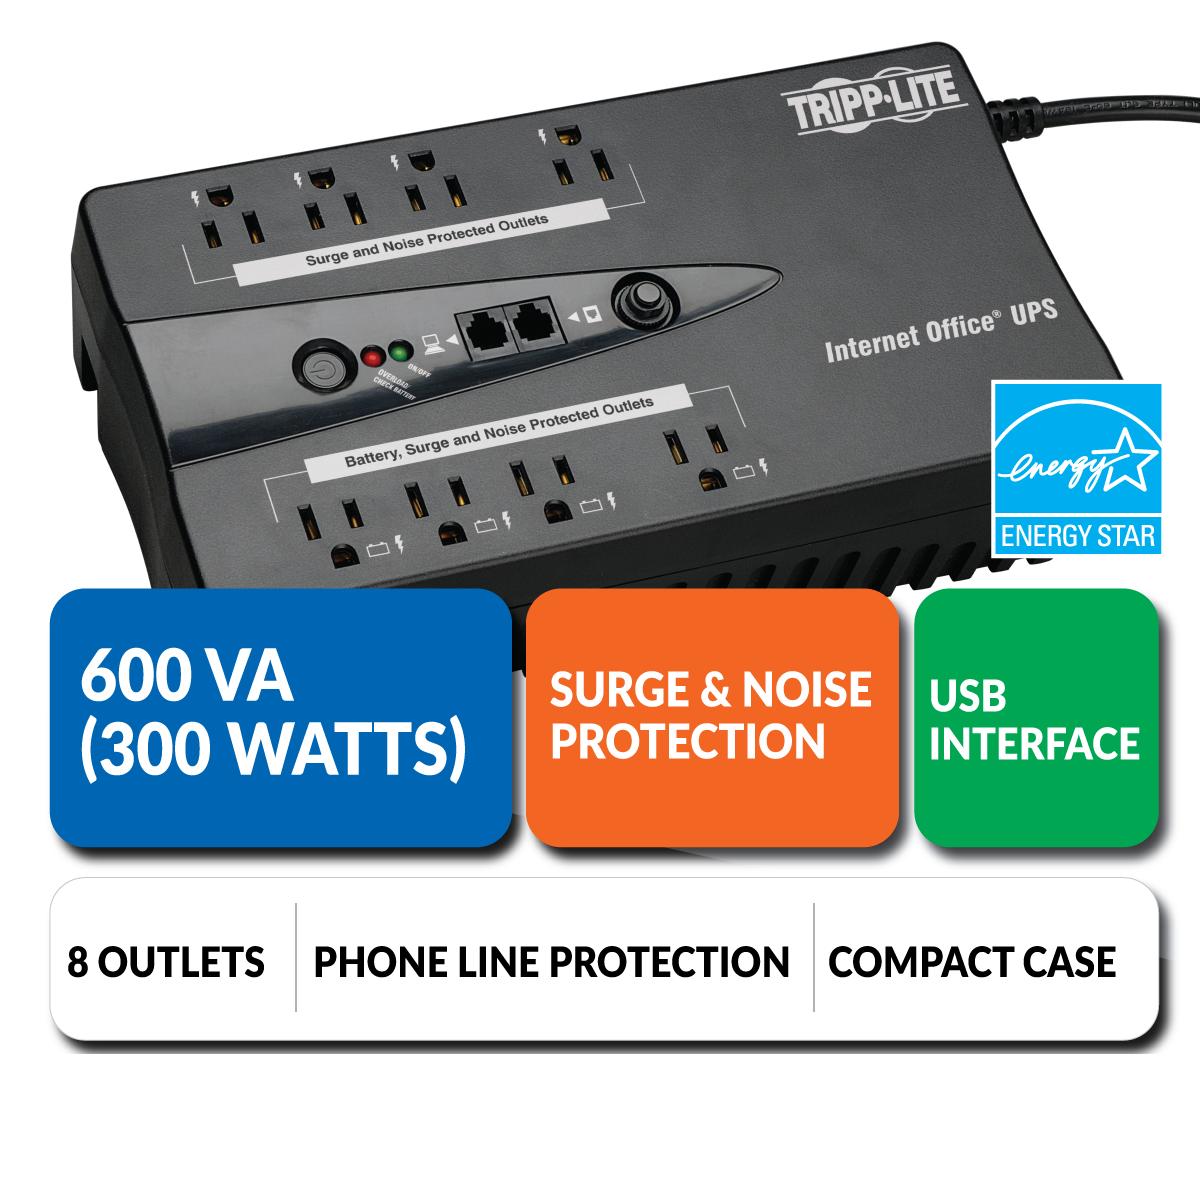 Amazon.com: Tripp Lite 600VA UPS Desktop Battery Back Up, 8 Outlet ...